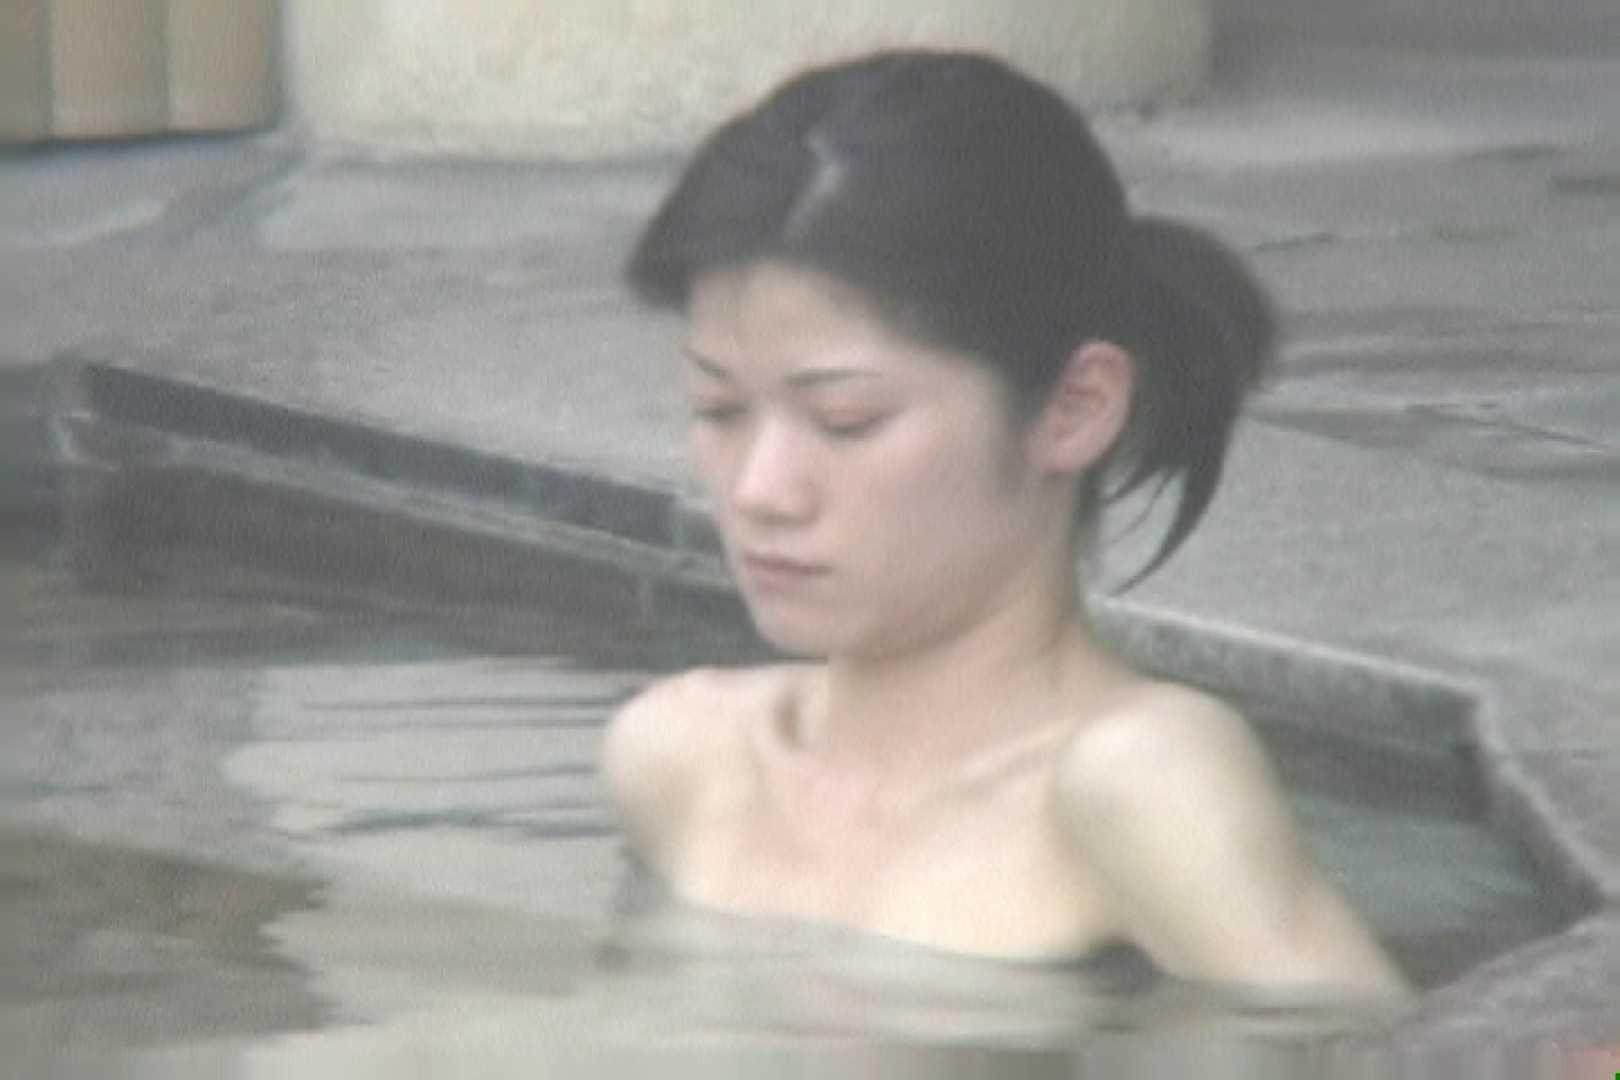 Aquaな露天風呂Vol.686 HなOL のぞき動画キャプチャ 83pic 12